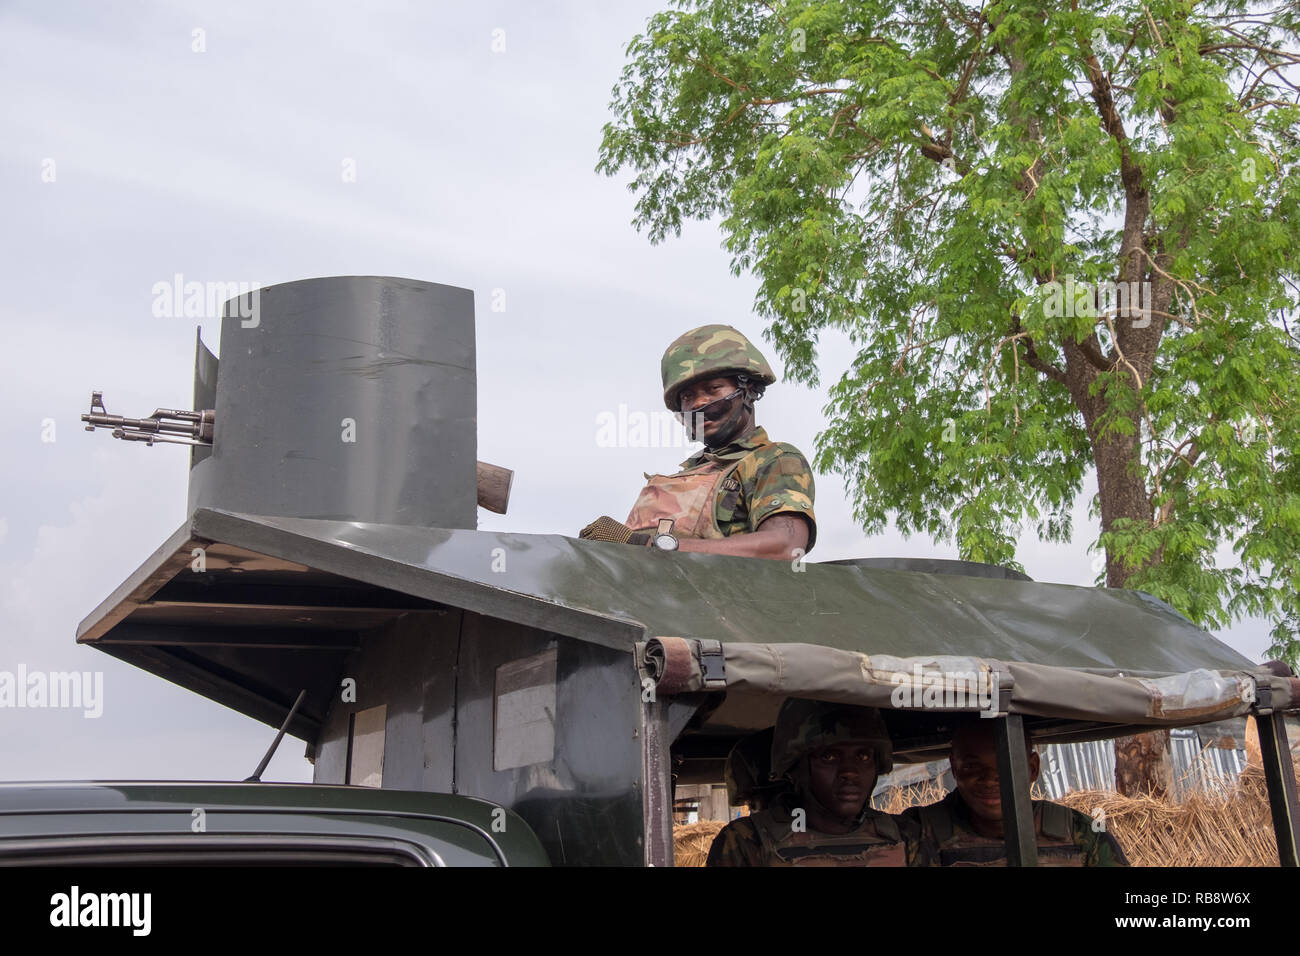 Nigeria Military Stock Photos & Nigeria Military Stock Images - Alamy